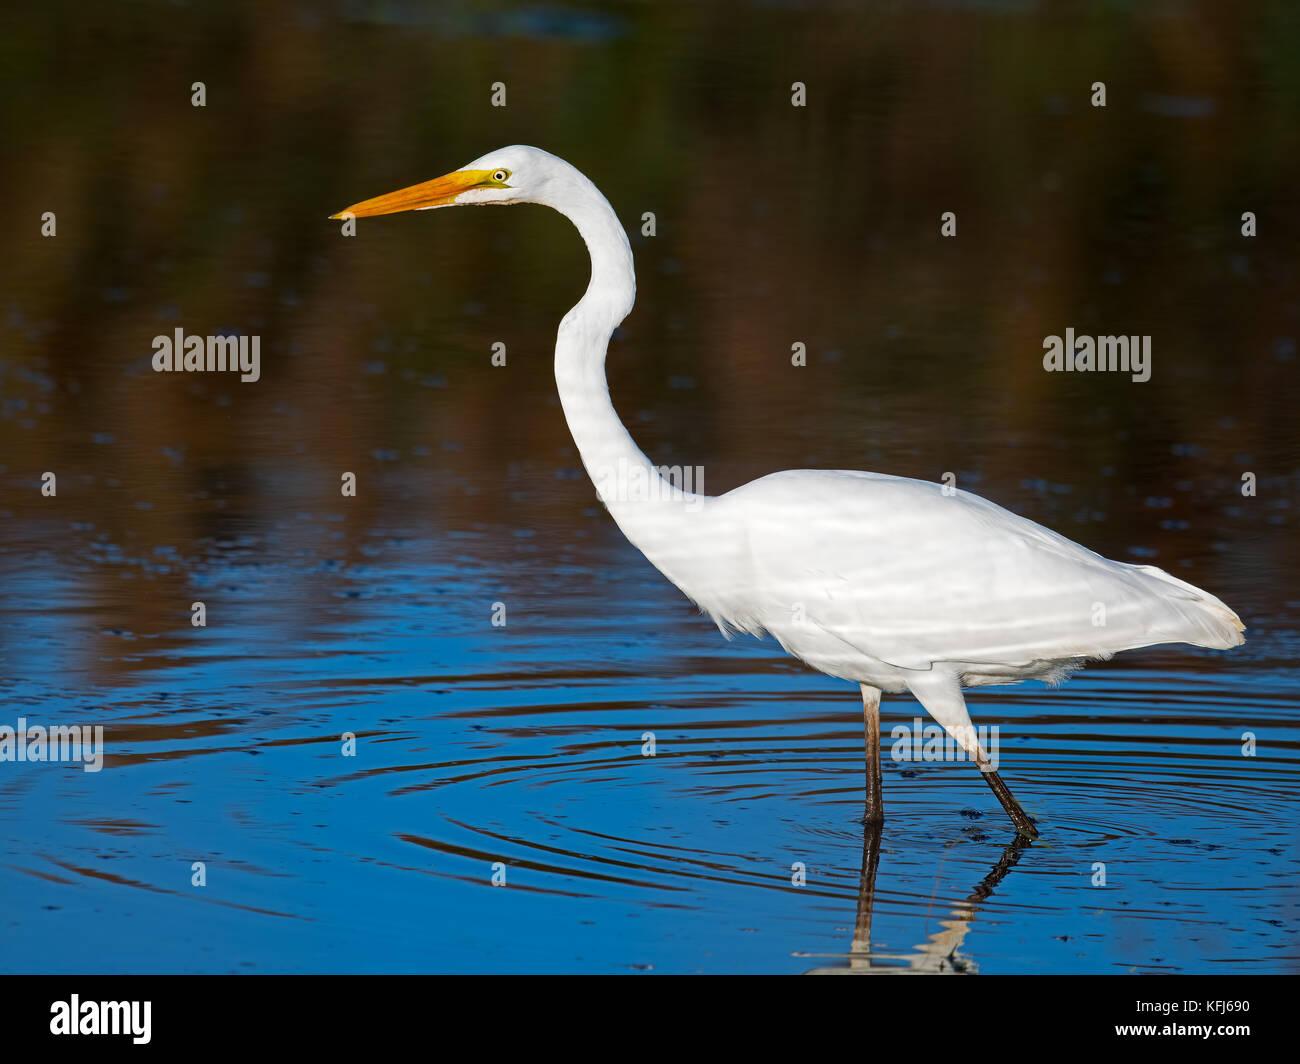 Great Egret - Stock Image